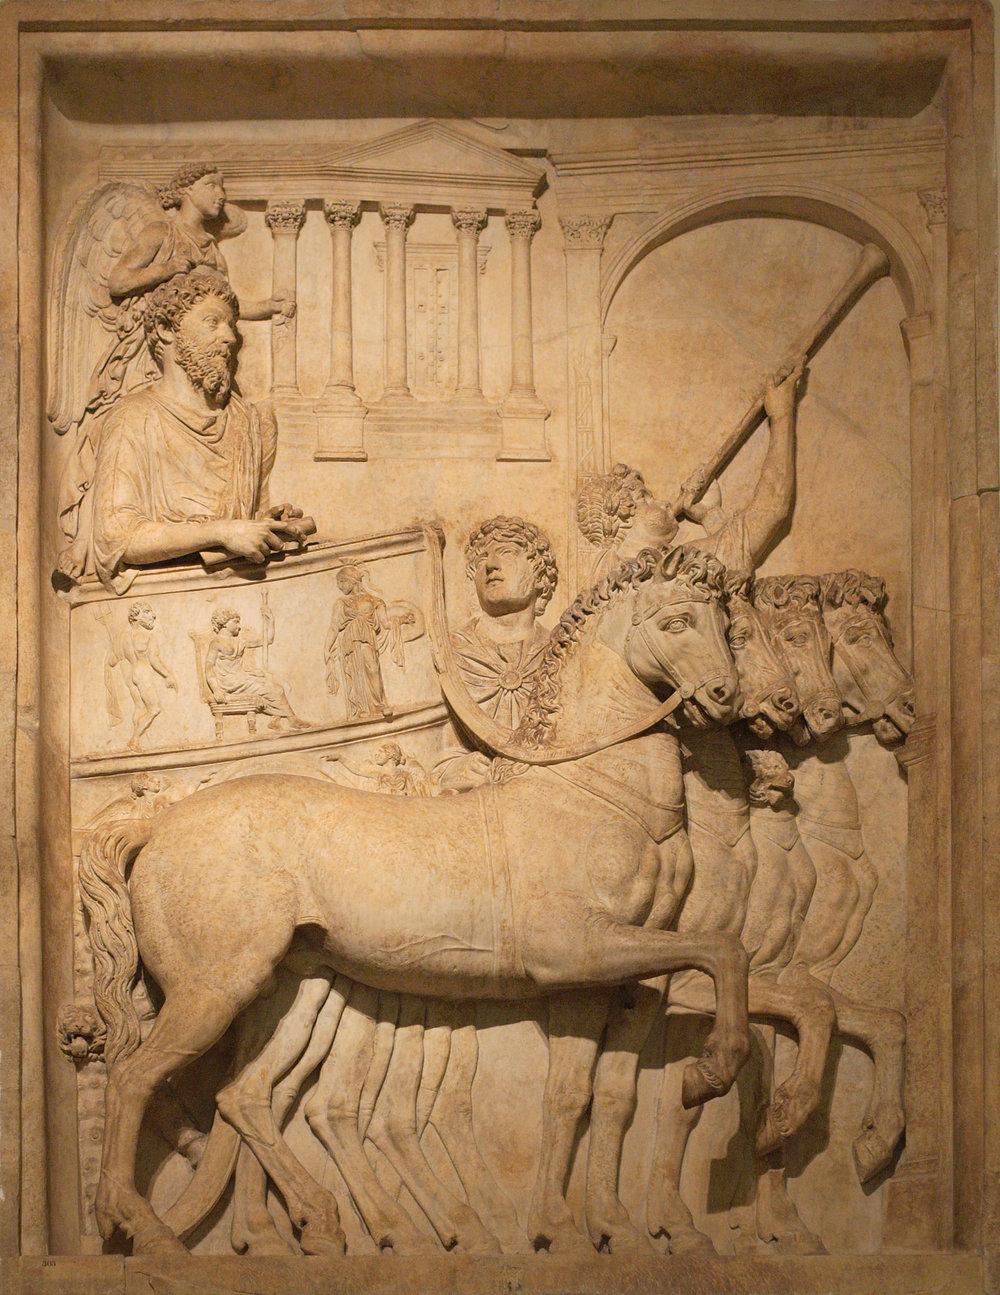 Bas_relief_from_Arch_of_Marcus_Aurelius_triumph_chariot.jpg